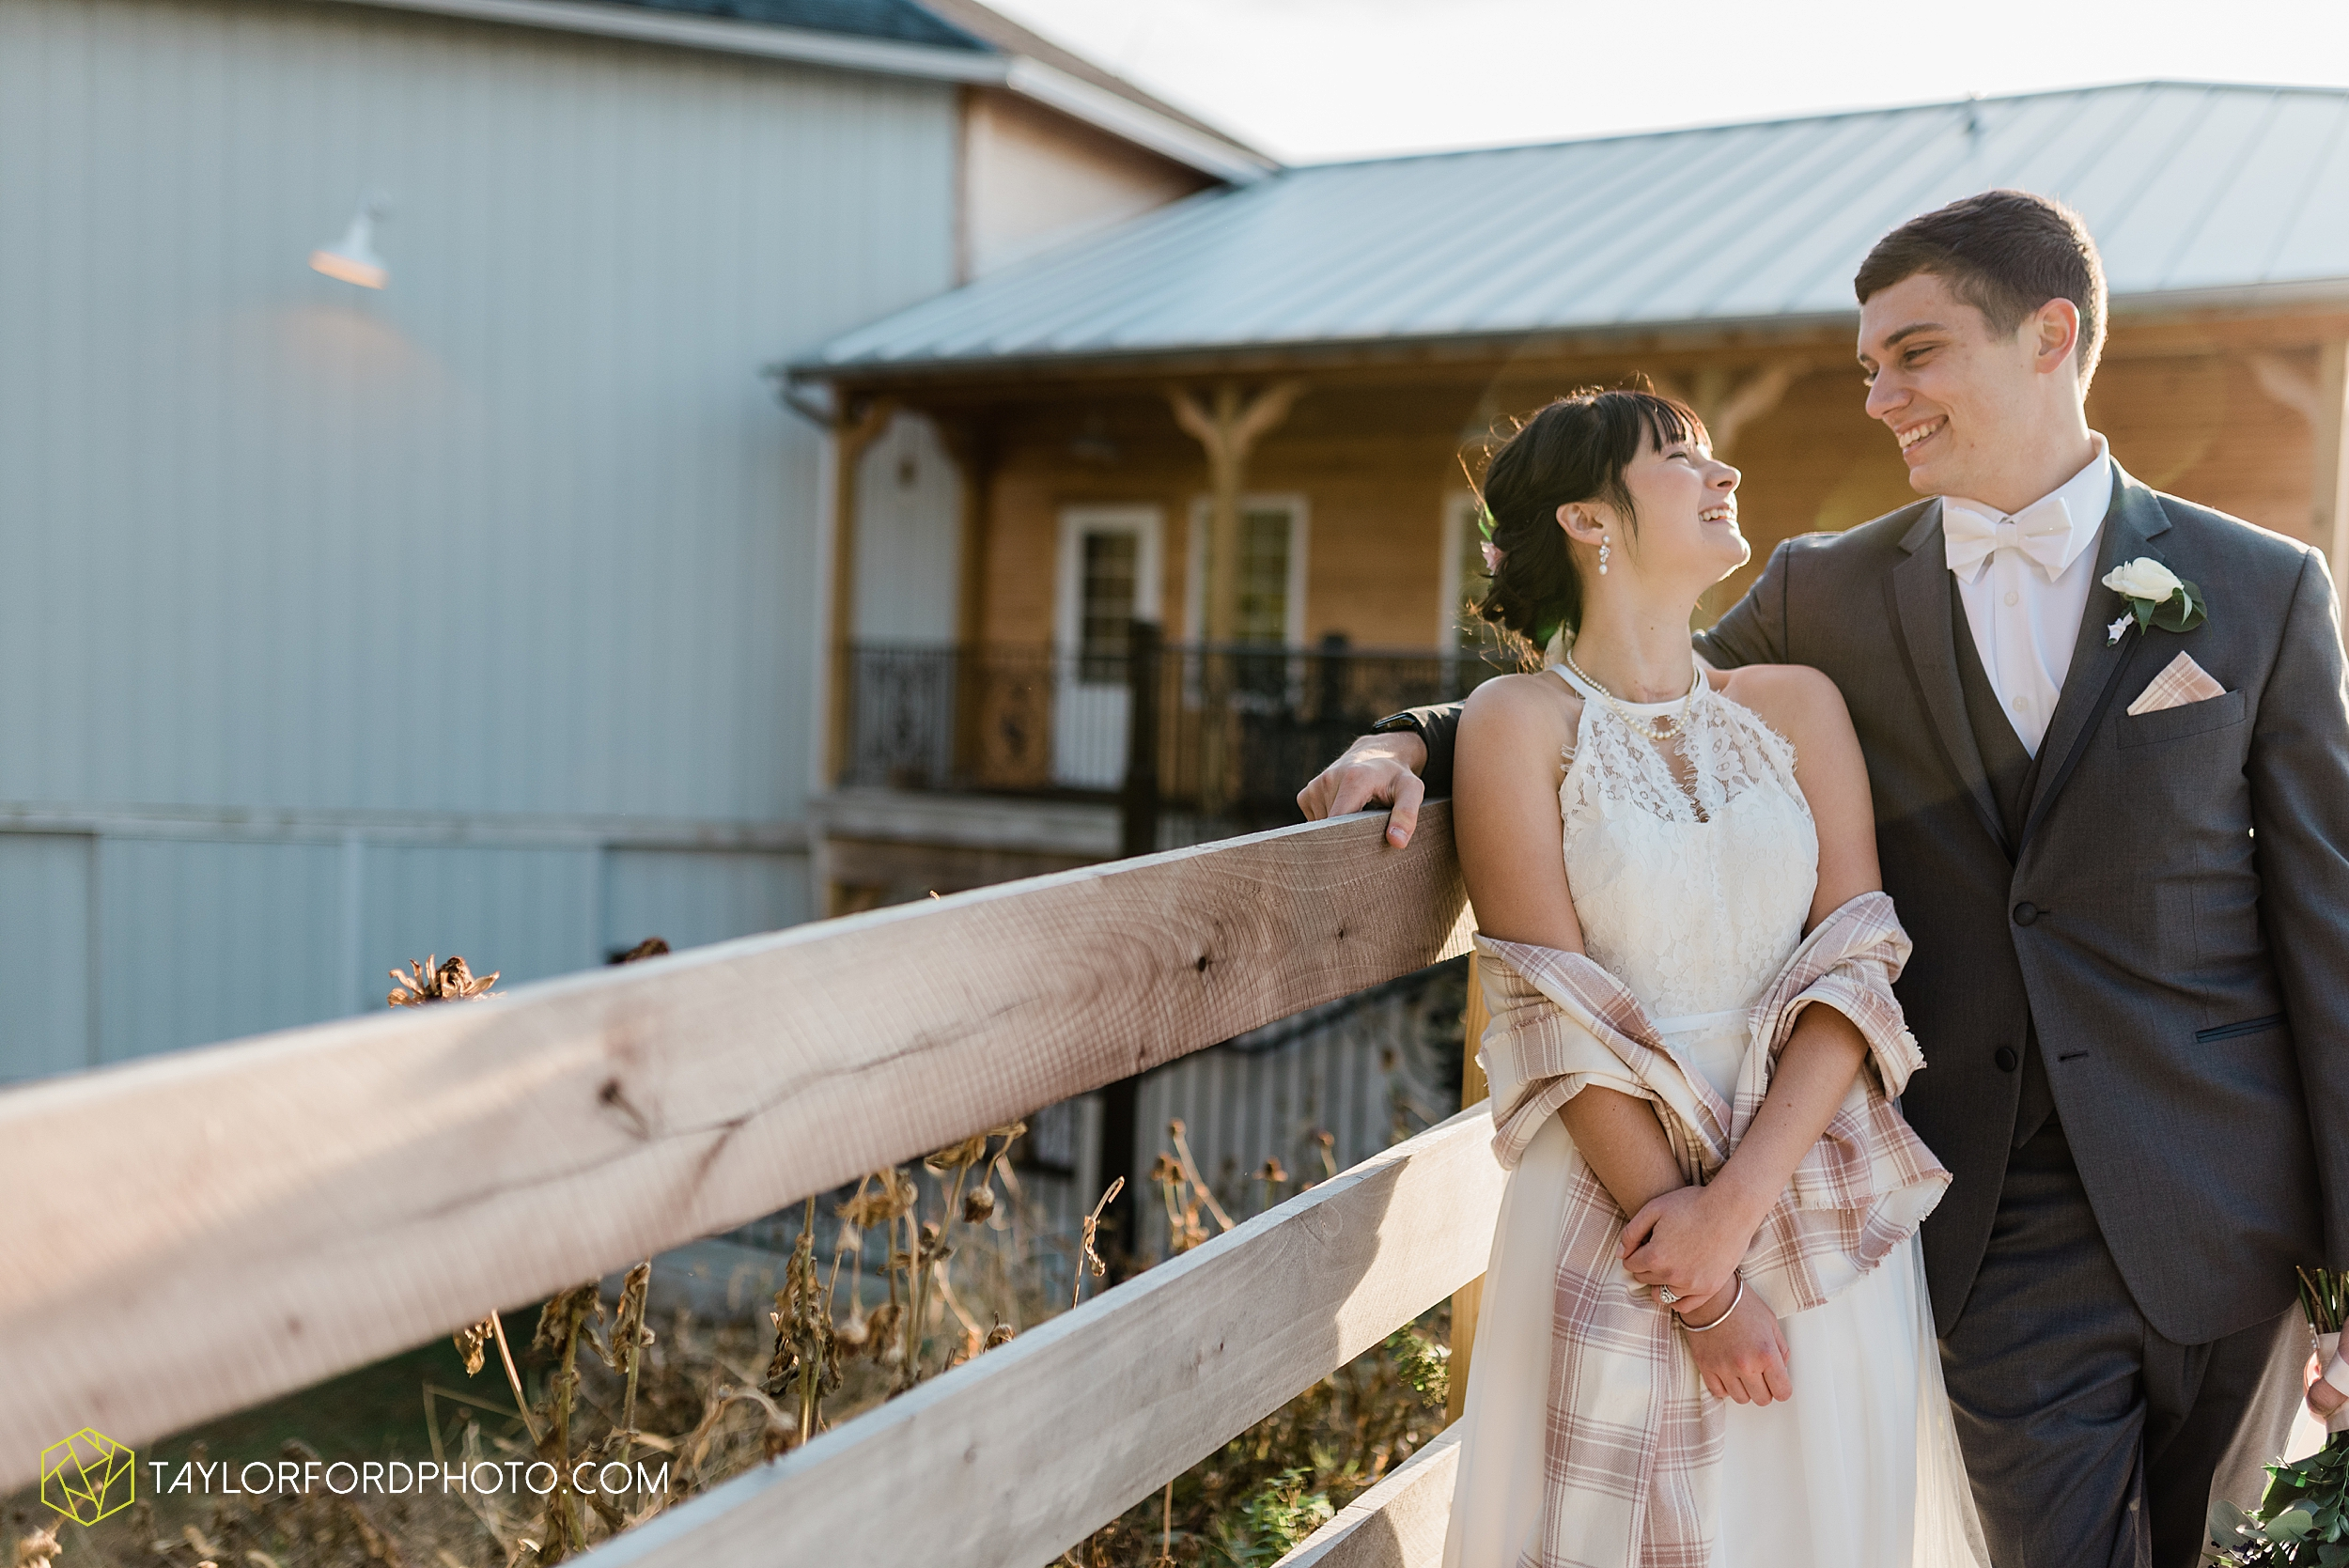 marissa-nicole-nick-daeger-orrmont-estate-farm-wedding-piqua-dayton-troy-ohio-fall-photographer-taylor-ford-photography_1555.jpg